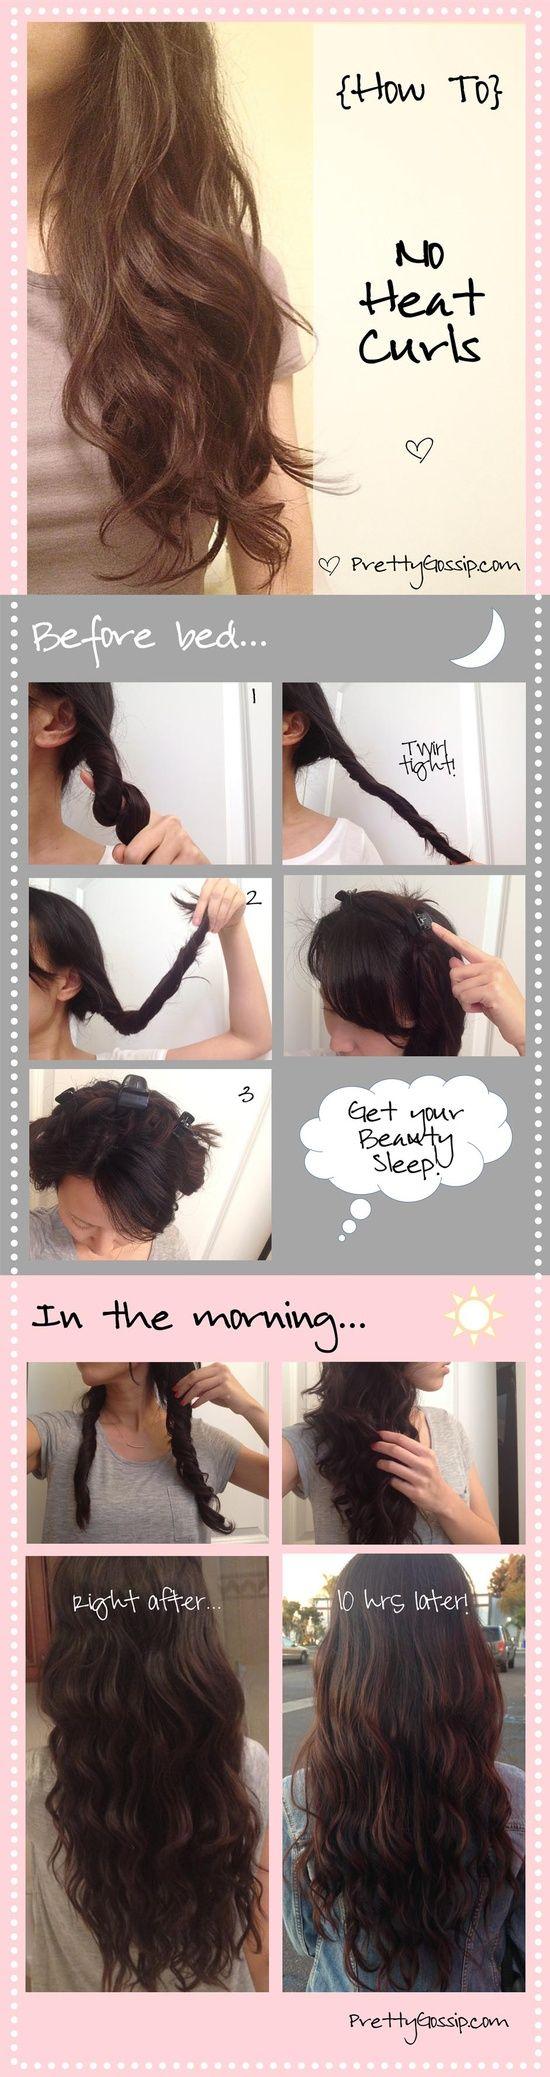 No heat curls hair and makeup pinterest hair hair beauty and